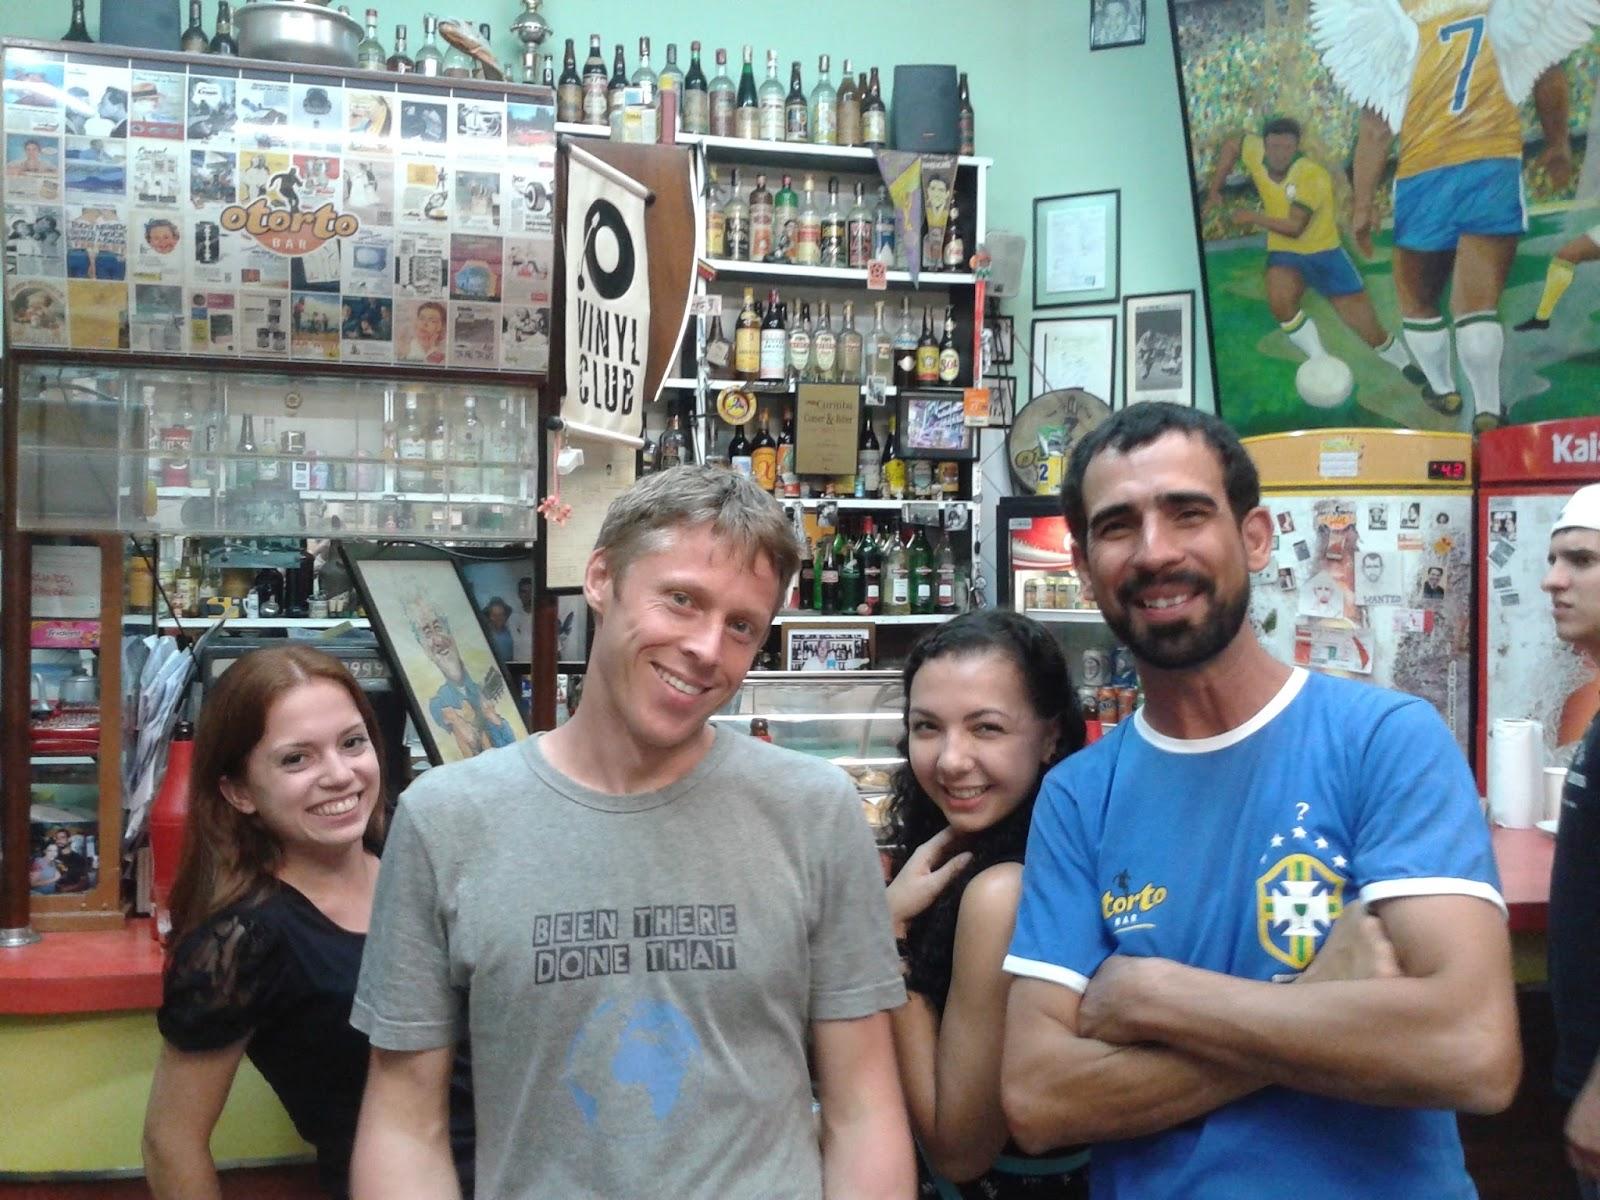 Gunnar Garfors no Brasil